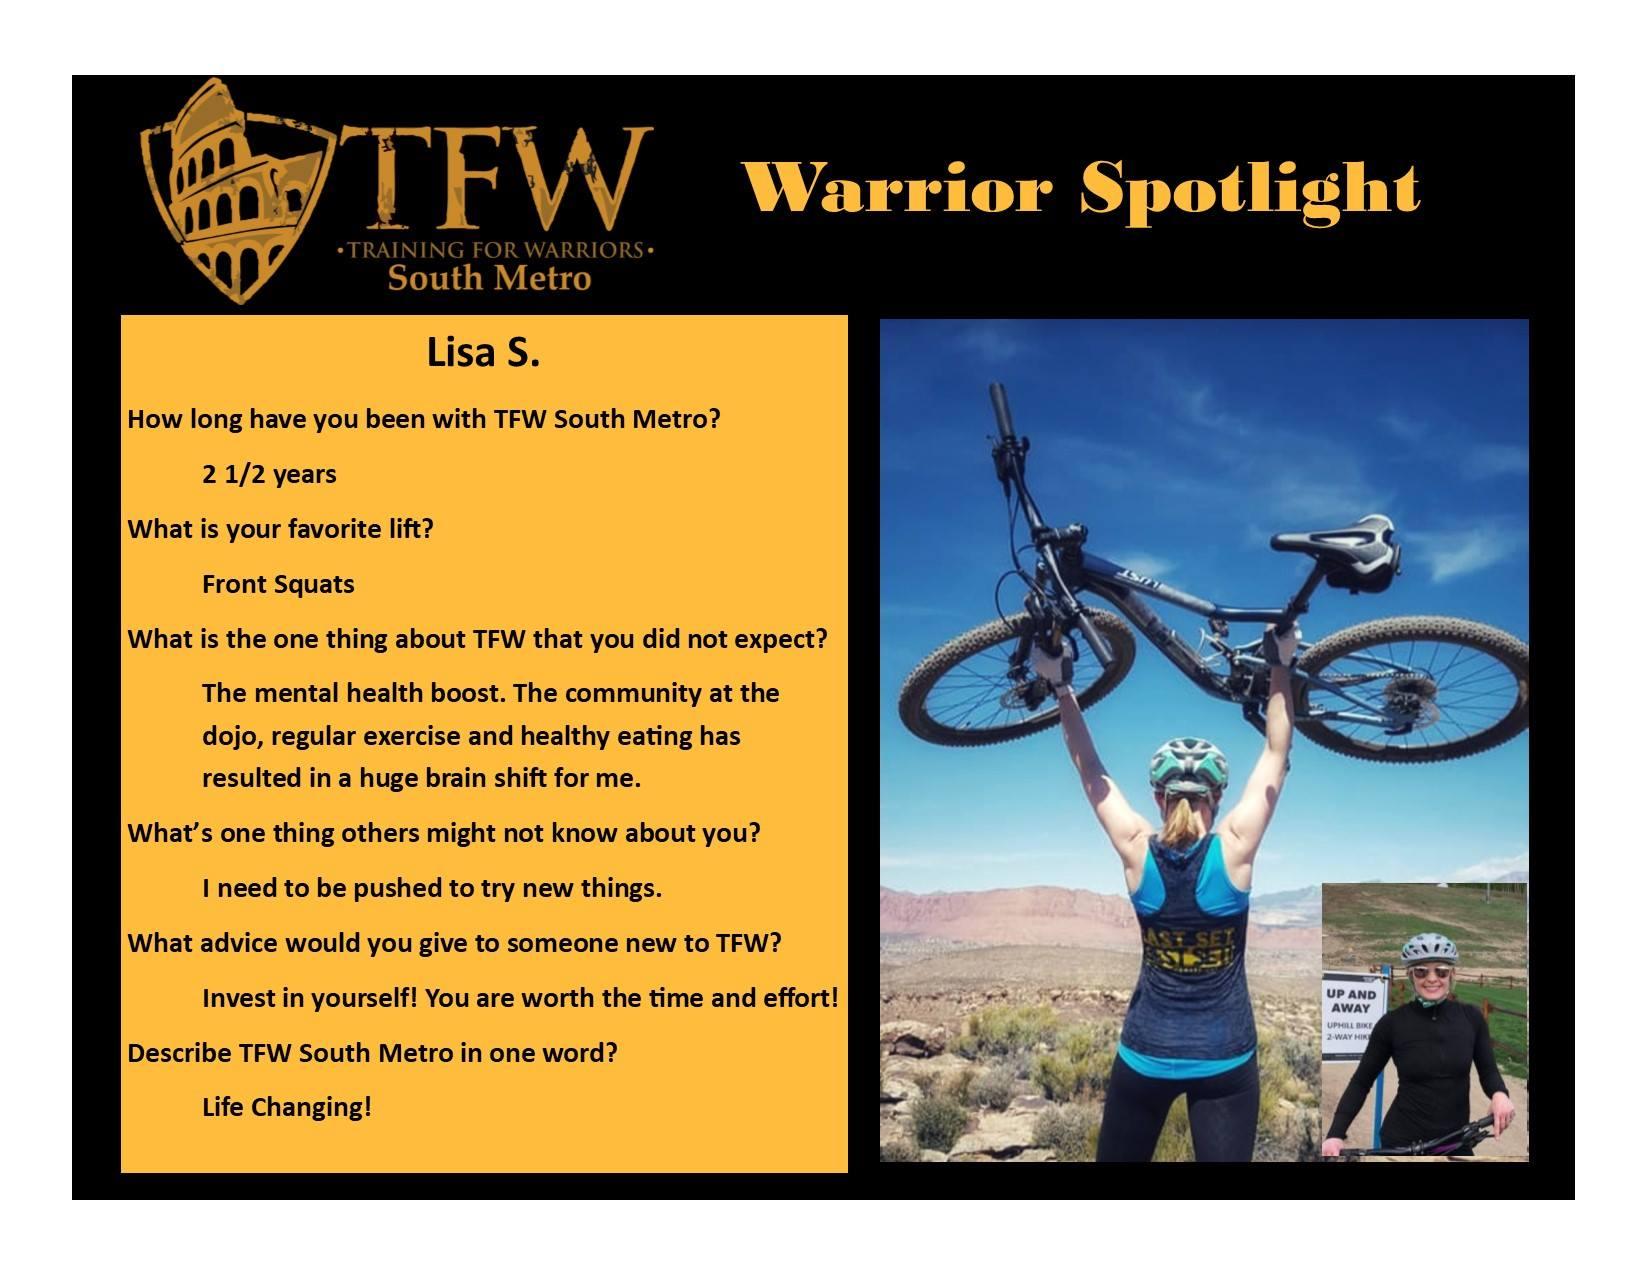 TFW South Metro Warrior, Lisa